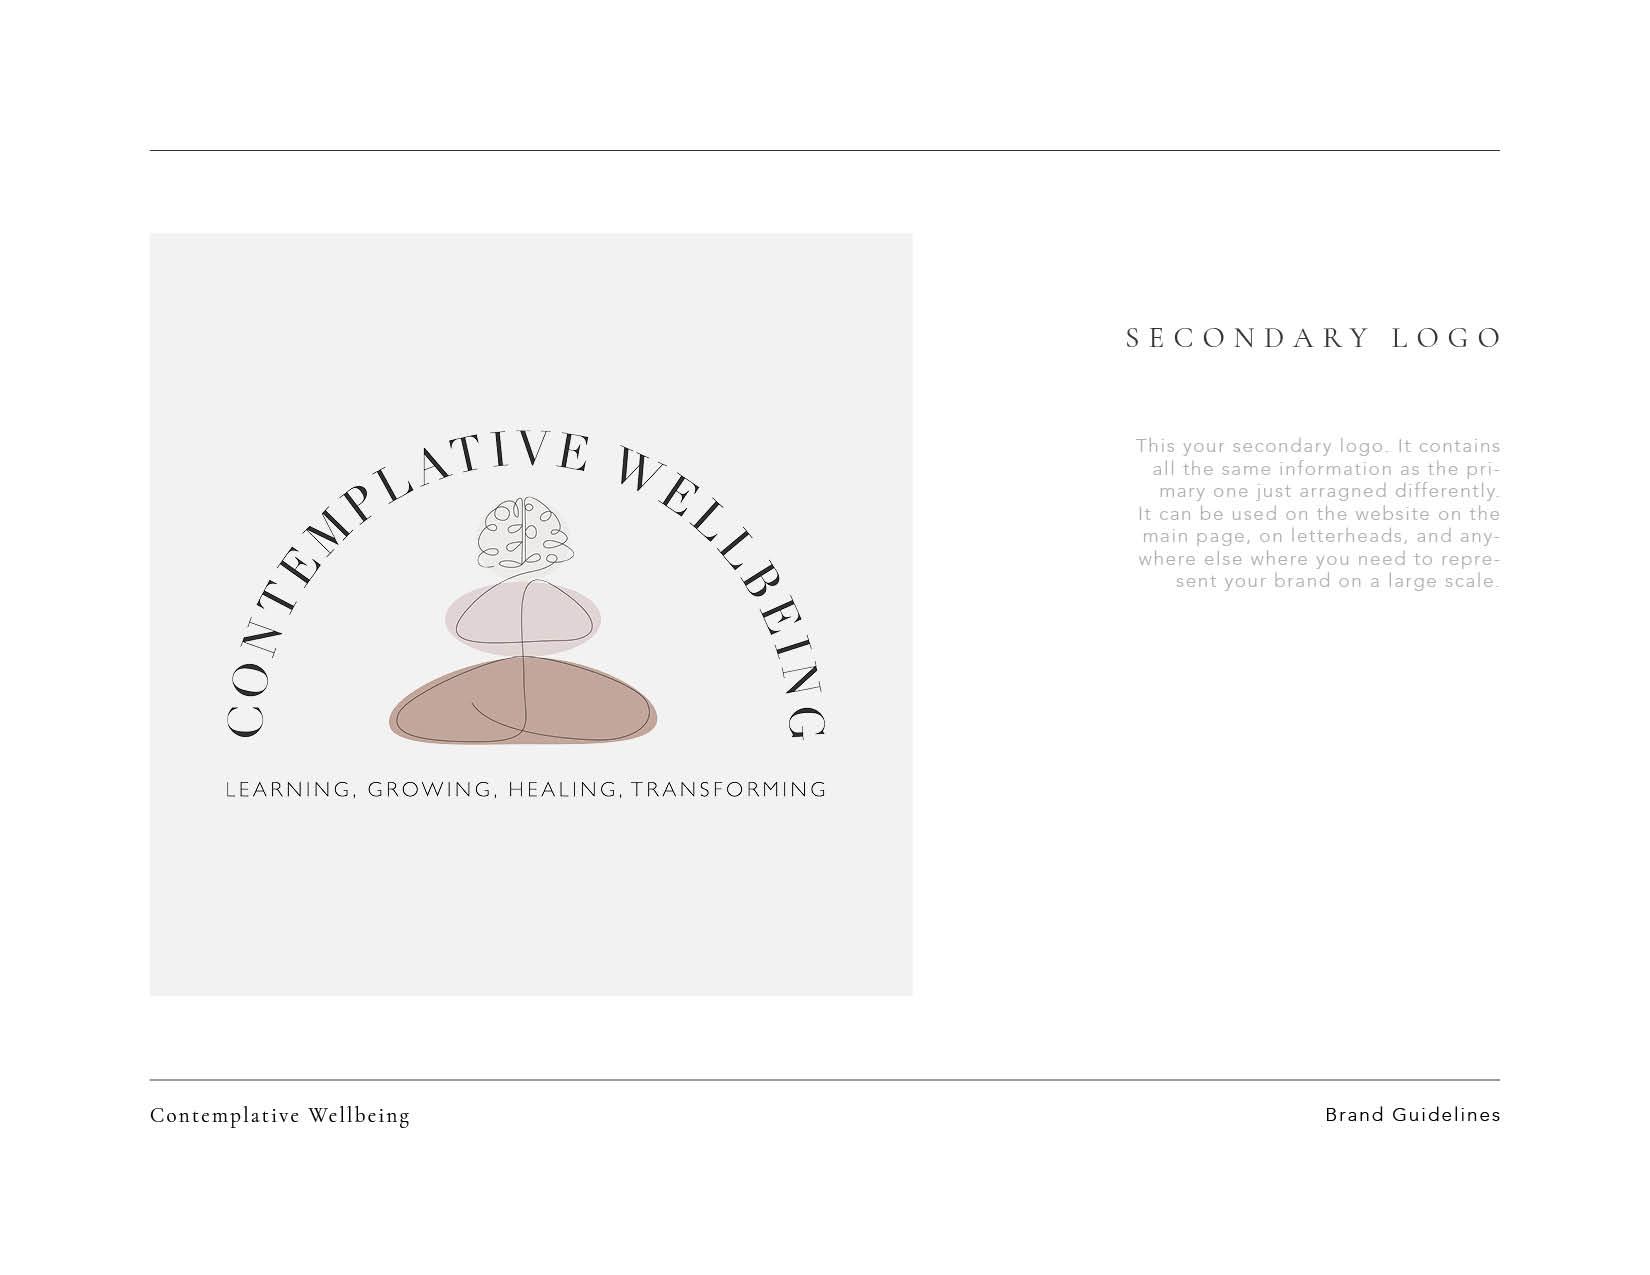 contemplative-wellbeing_brand-guidelines2.jpg